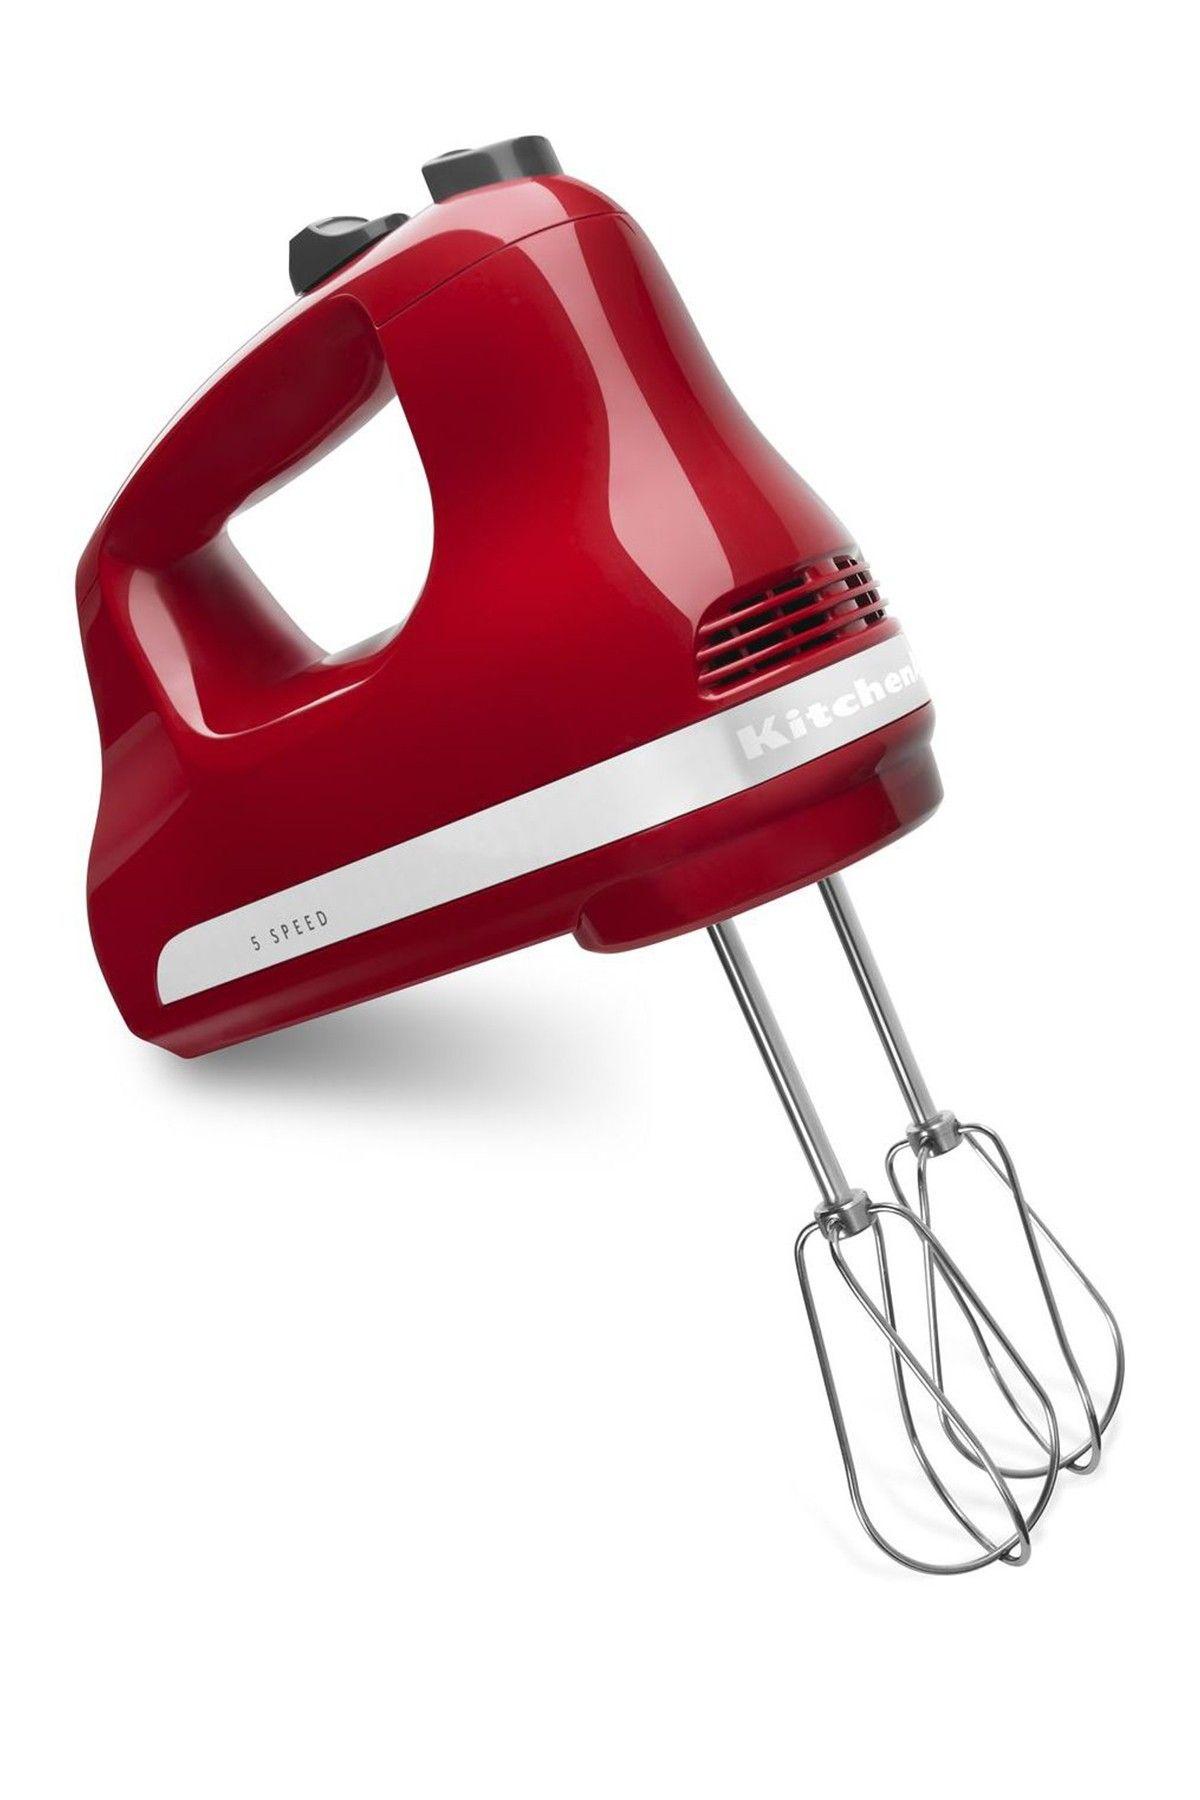 Kitchenaid 5speed hand mixer empire red hand mixer